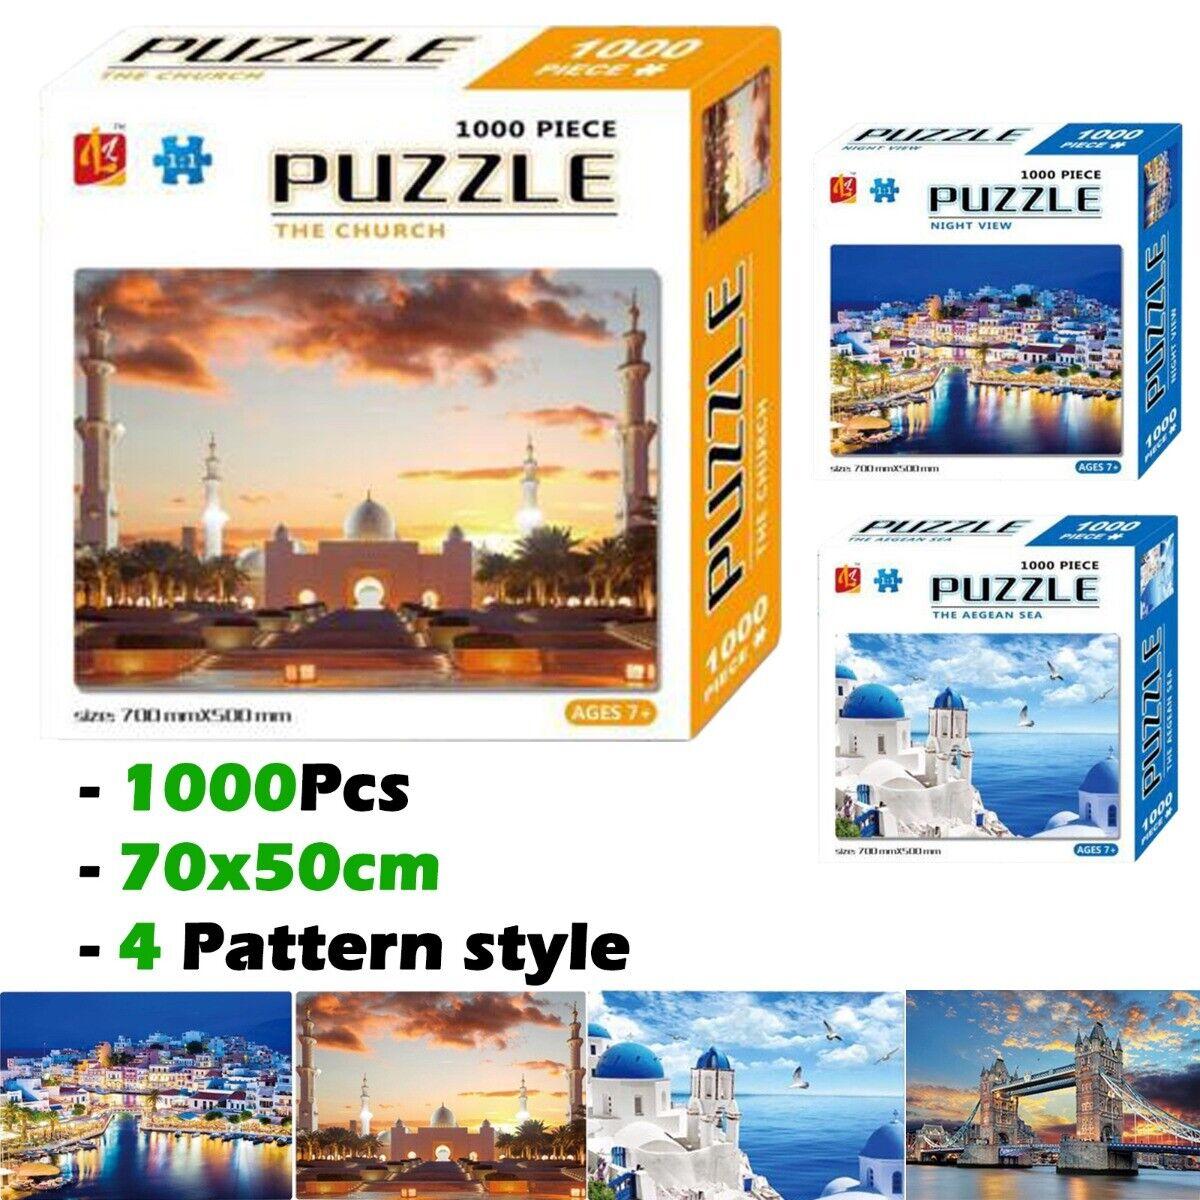 CORNER PIECE 500 PIECE JIGSAW PUZZLE NEW UNOPENED BUCKINGHAM PALACE FREE POSTAGE